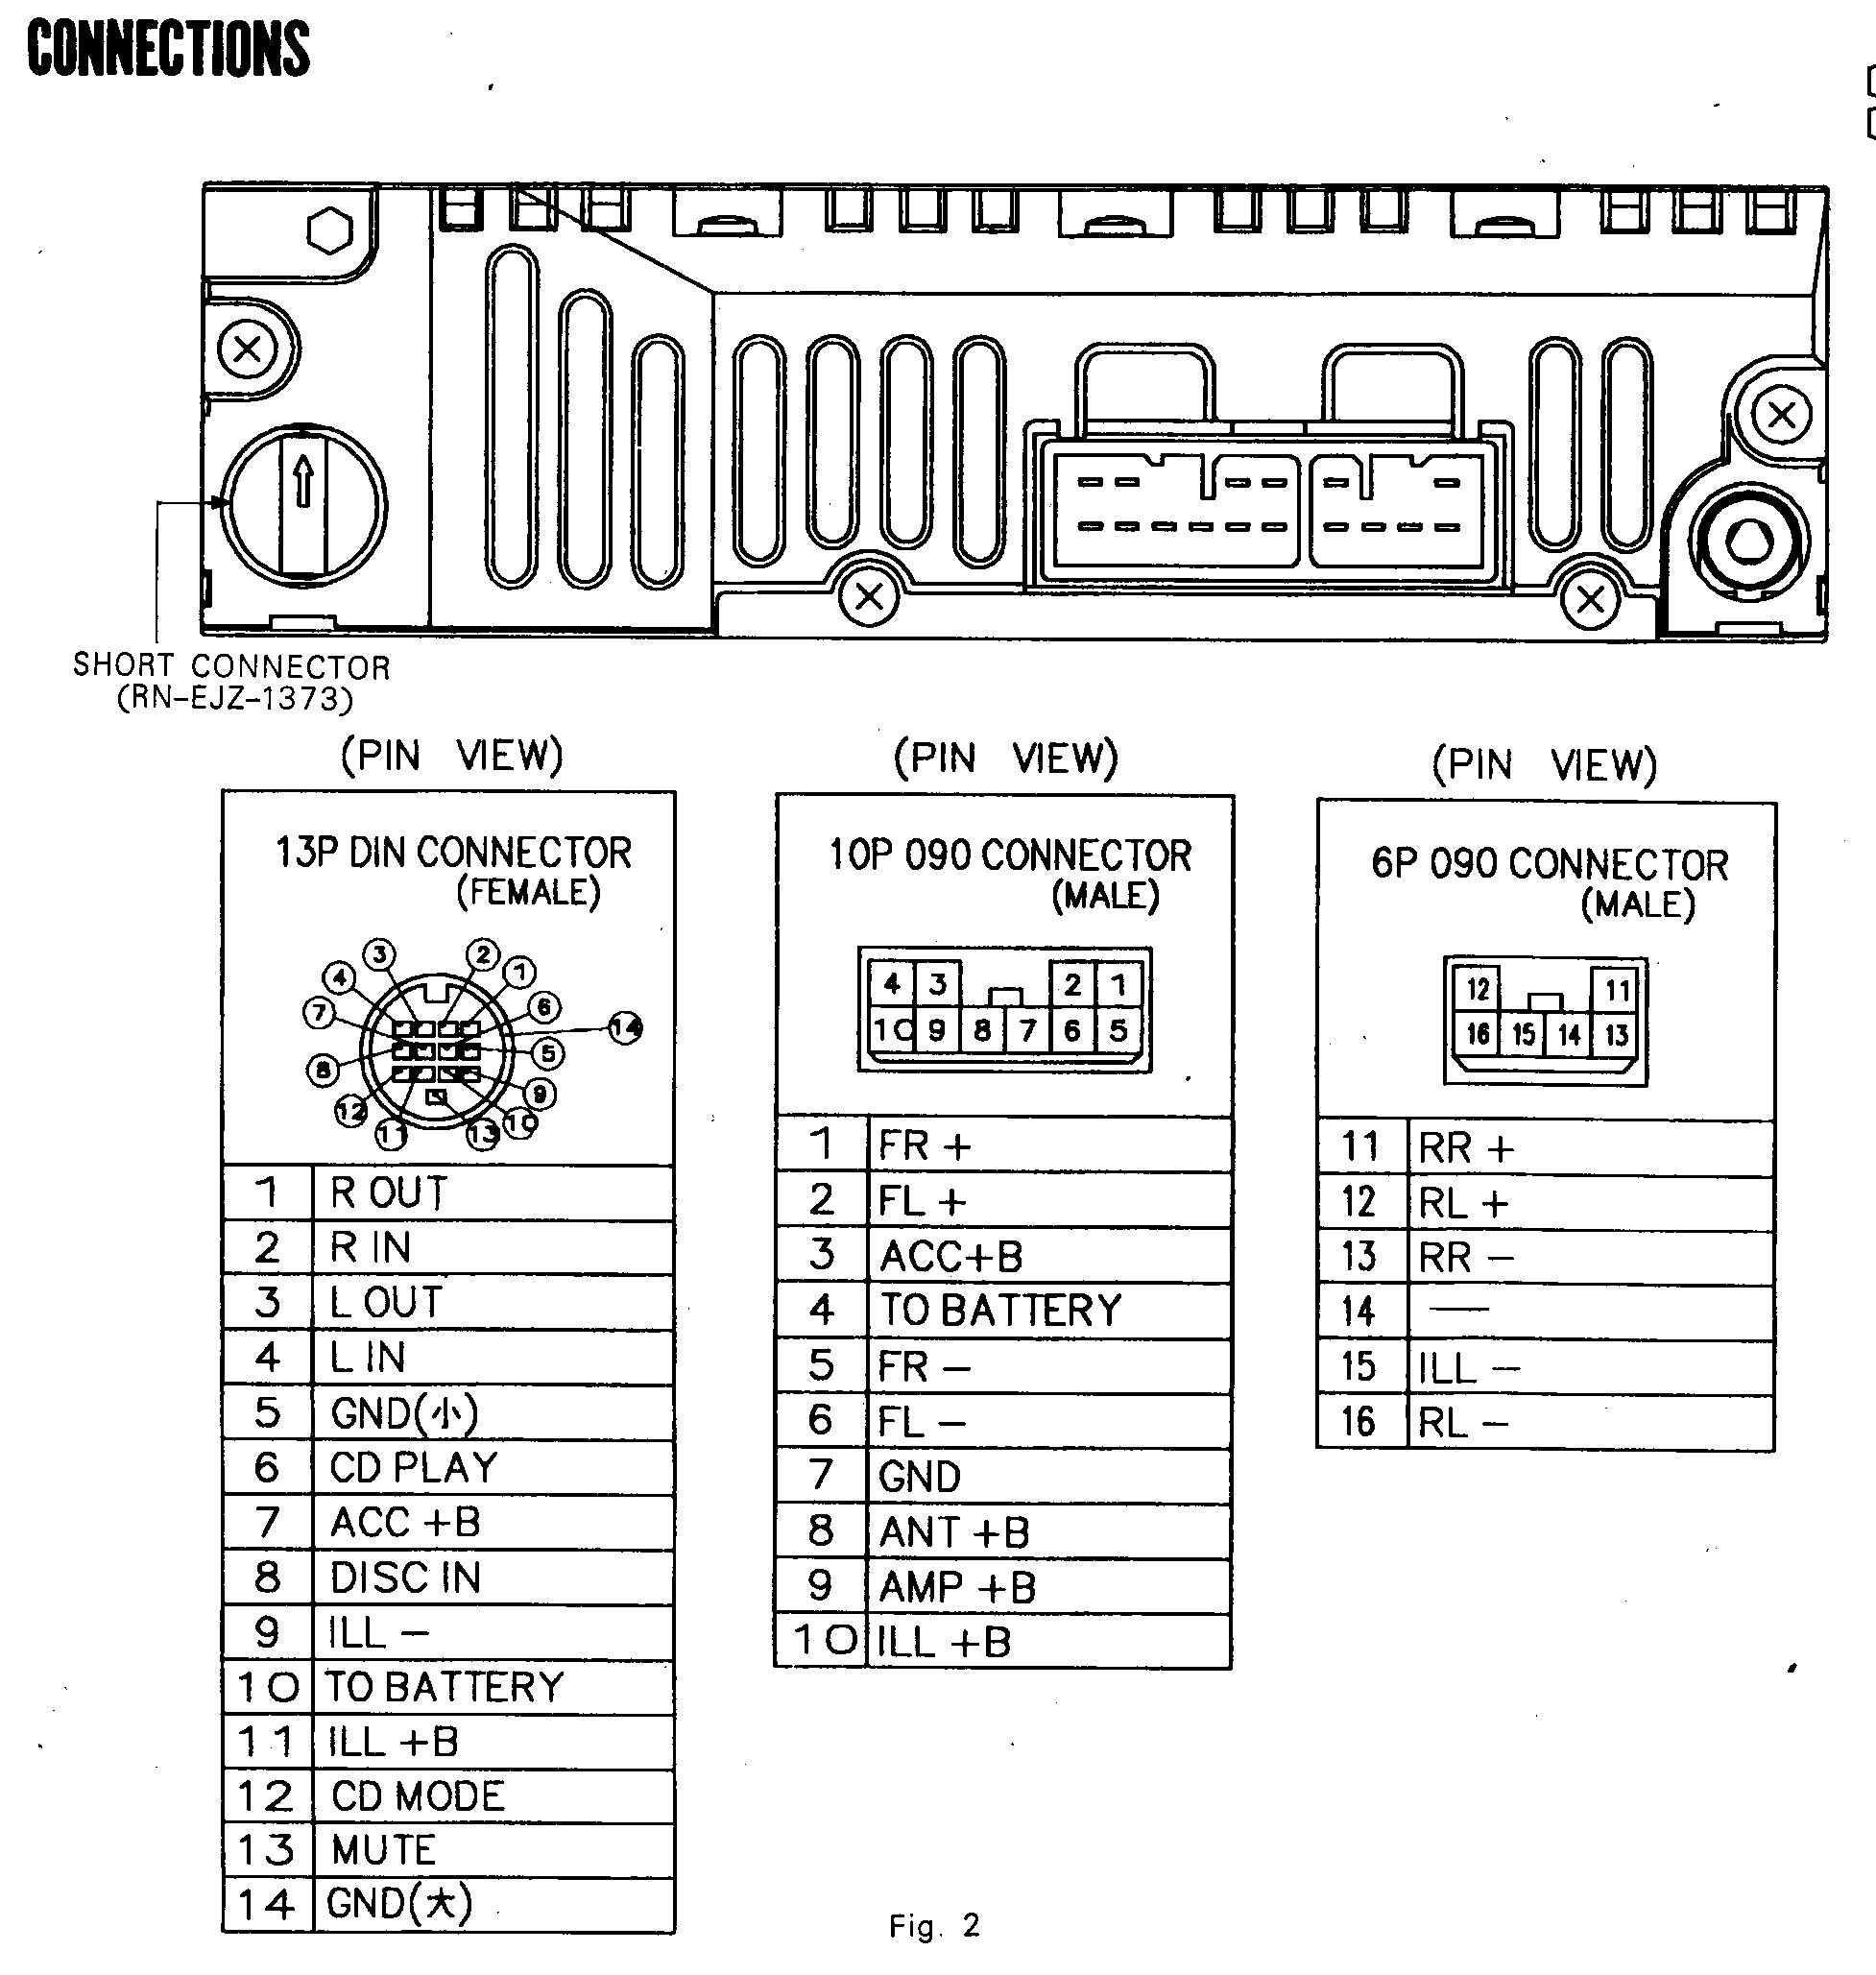 hight resolution of 2002 mercury mountaineer radio wiring diagram 1993 toyota corolla wiring diagram manual inspirationa toyota audio